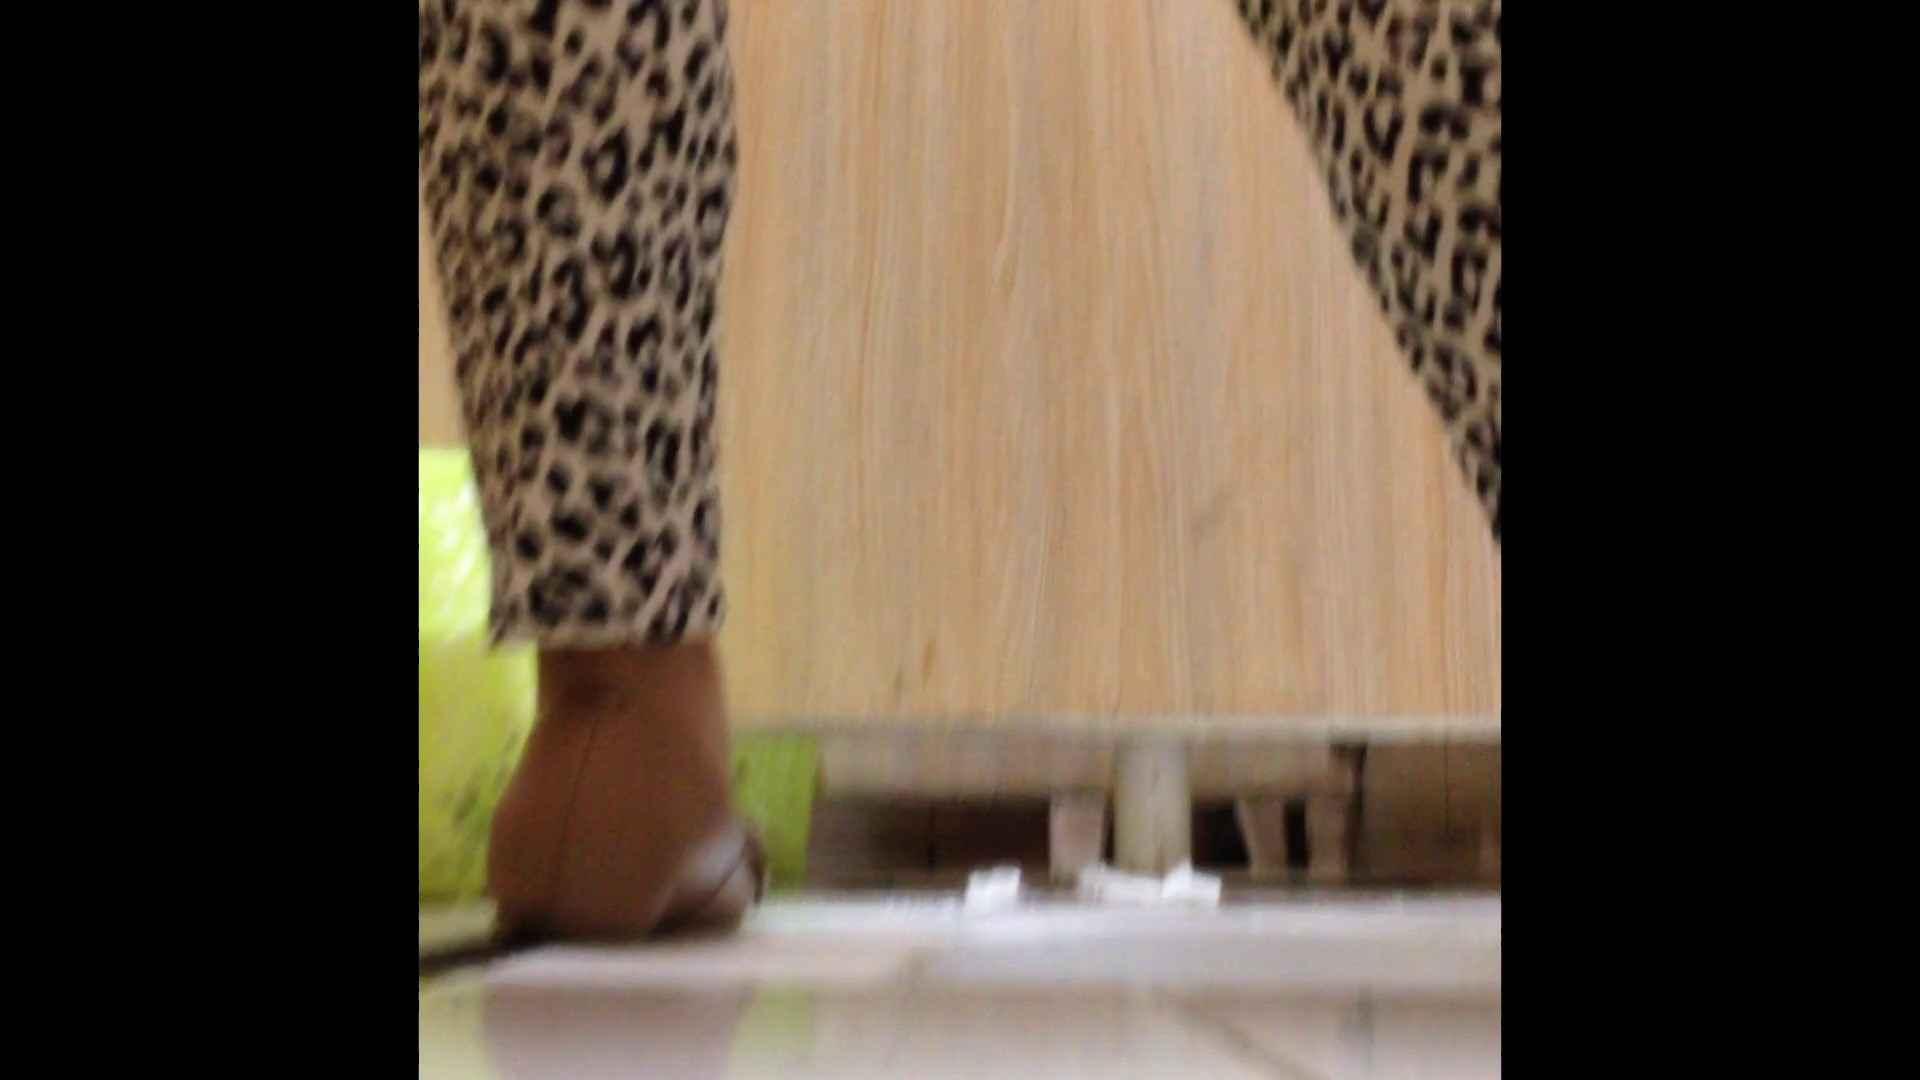 芸術大学ガチ潜入盗撮 JD盗撮 美女の洗面所の秘密 Vol.86 OLの実態 盗撮動画紹介 93pic 86